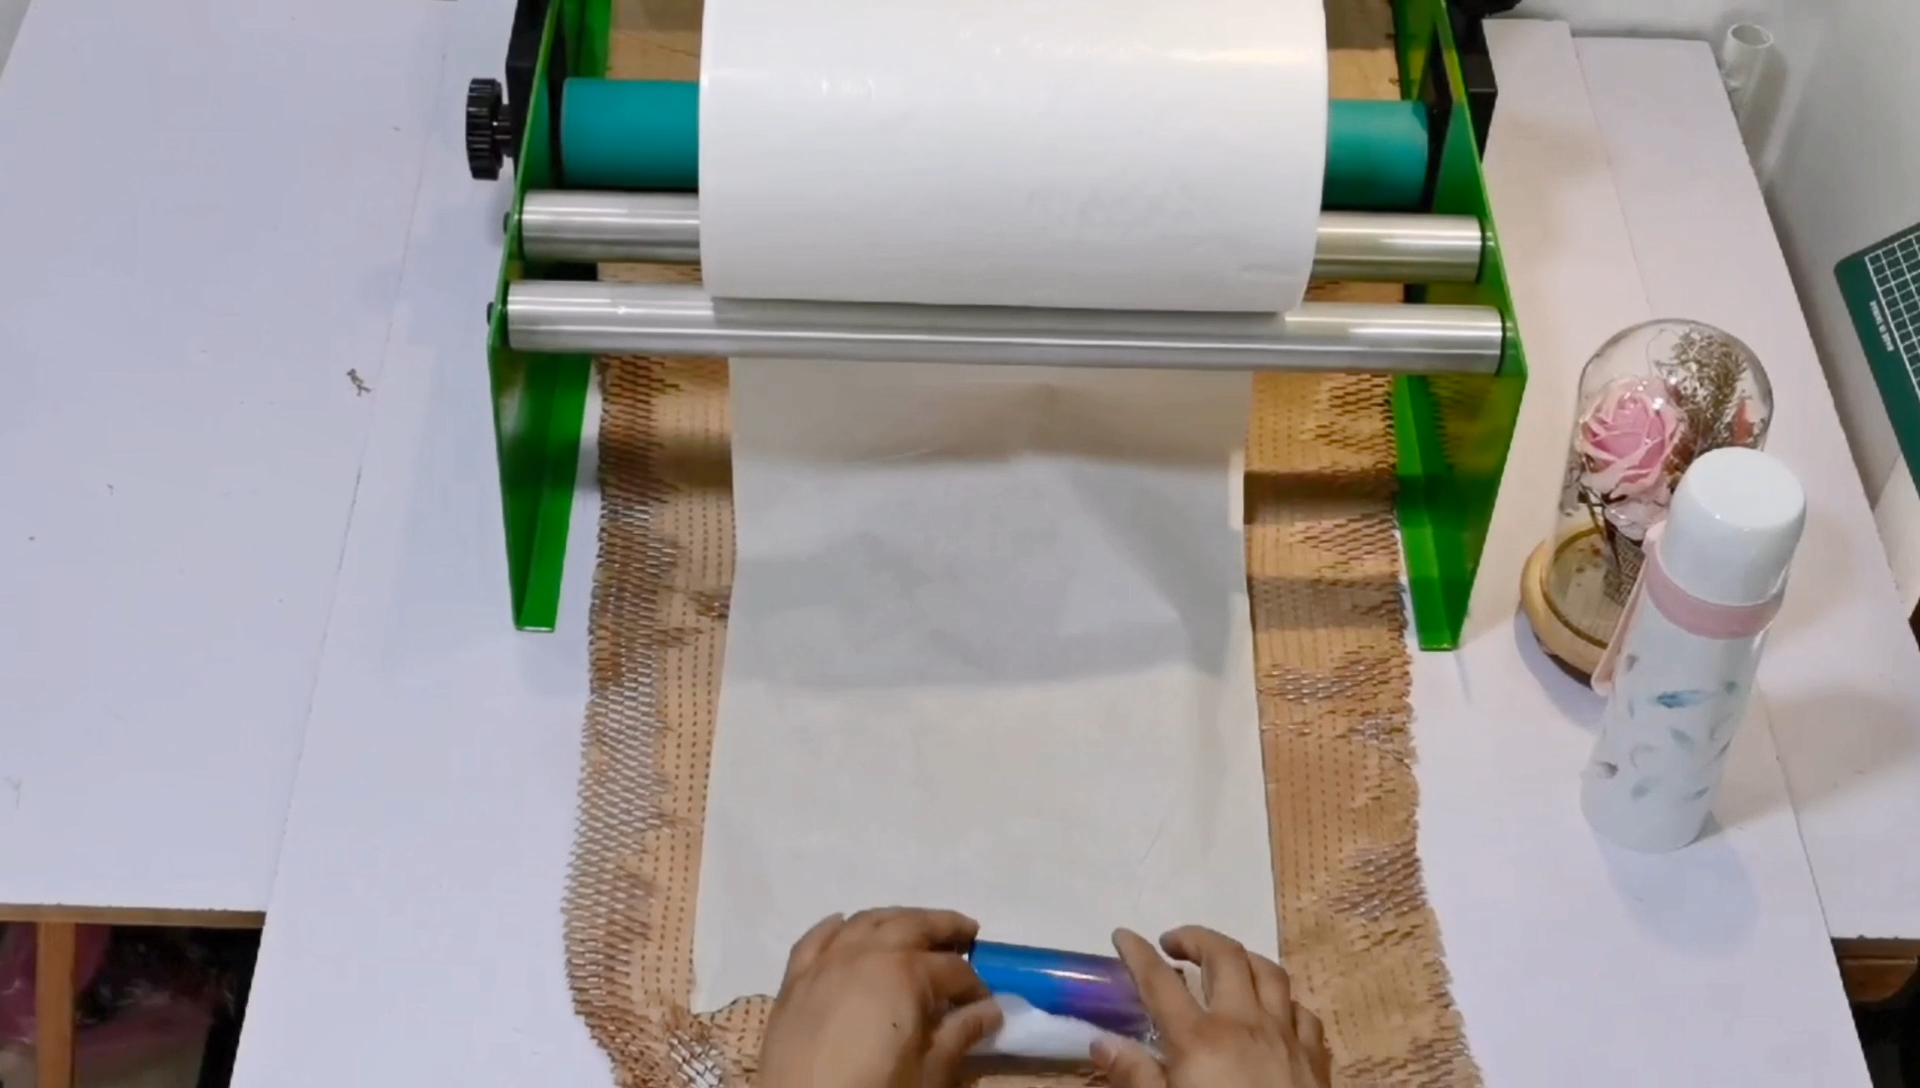 50cm * 120m çevre dostu ambalaj petek desenli kağıt toptan kahverengi, beyaz petek yastık kağıt petek Kraft kağıt